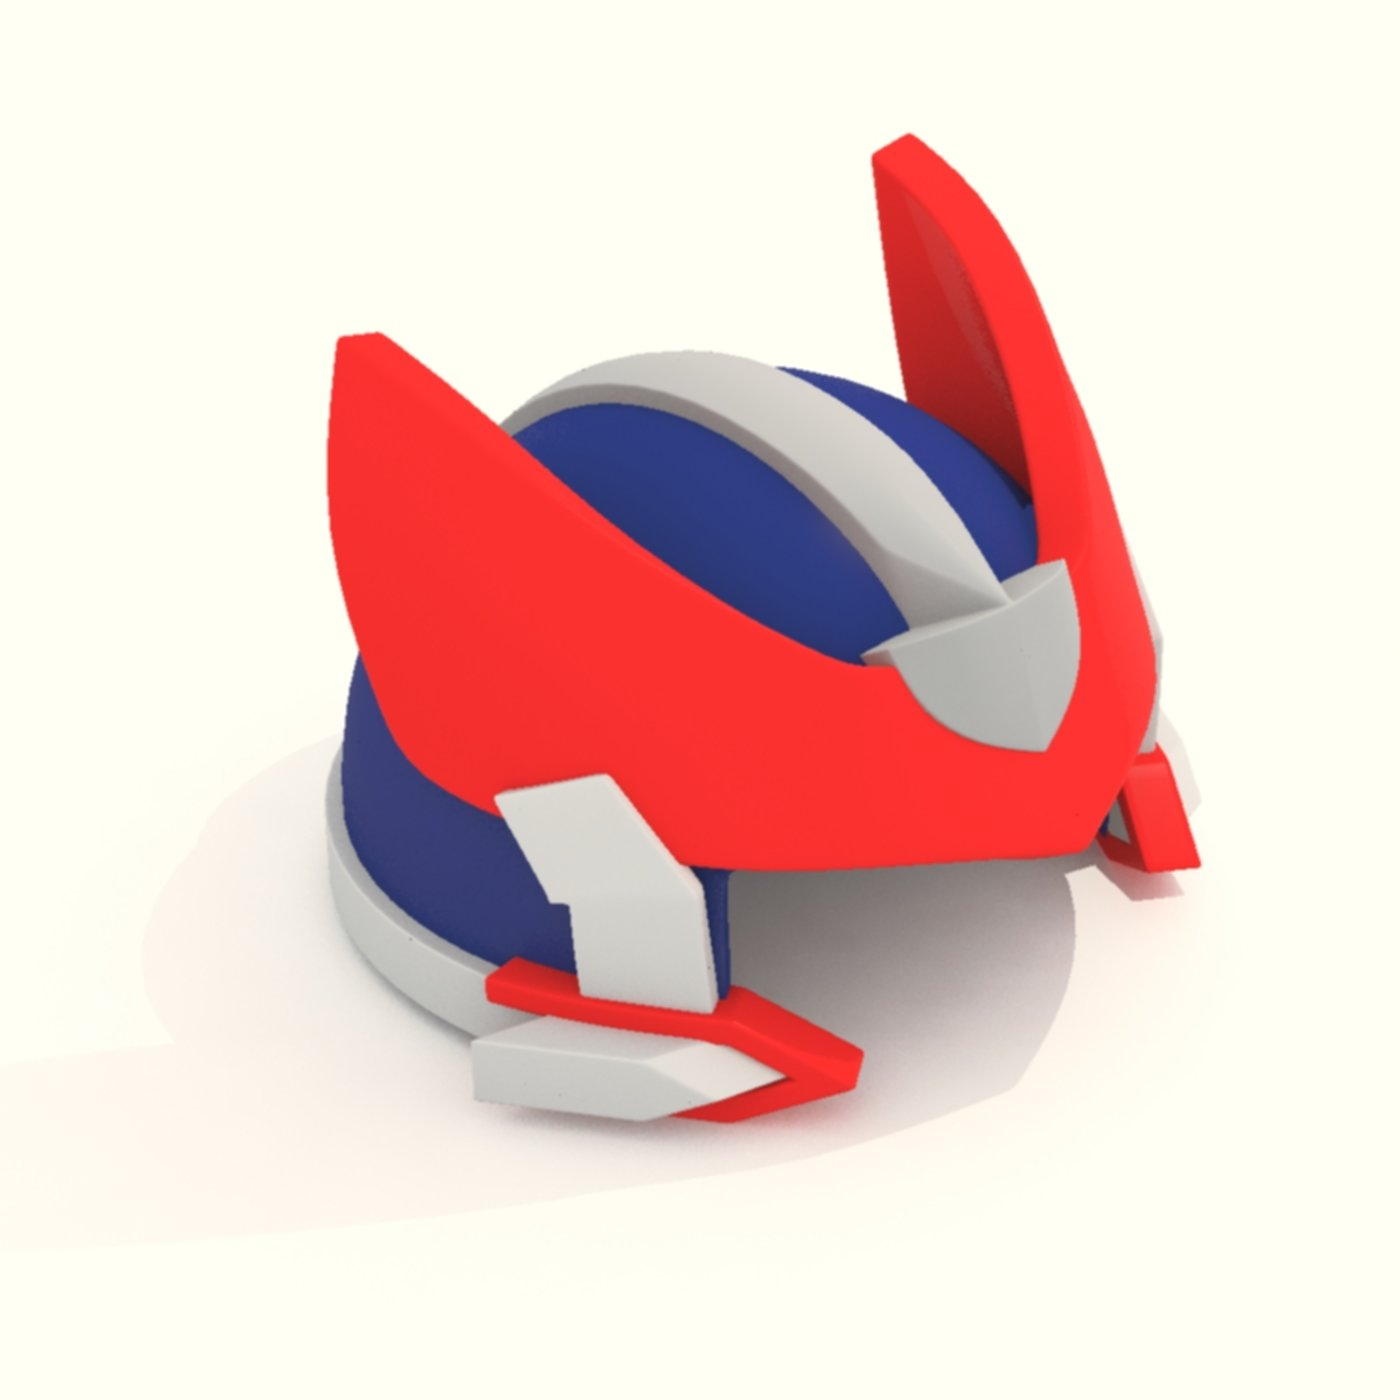 Cartoon Robot Helmet Model CRH6